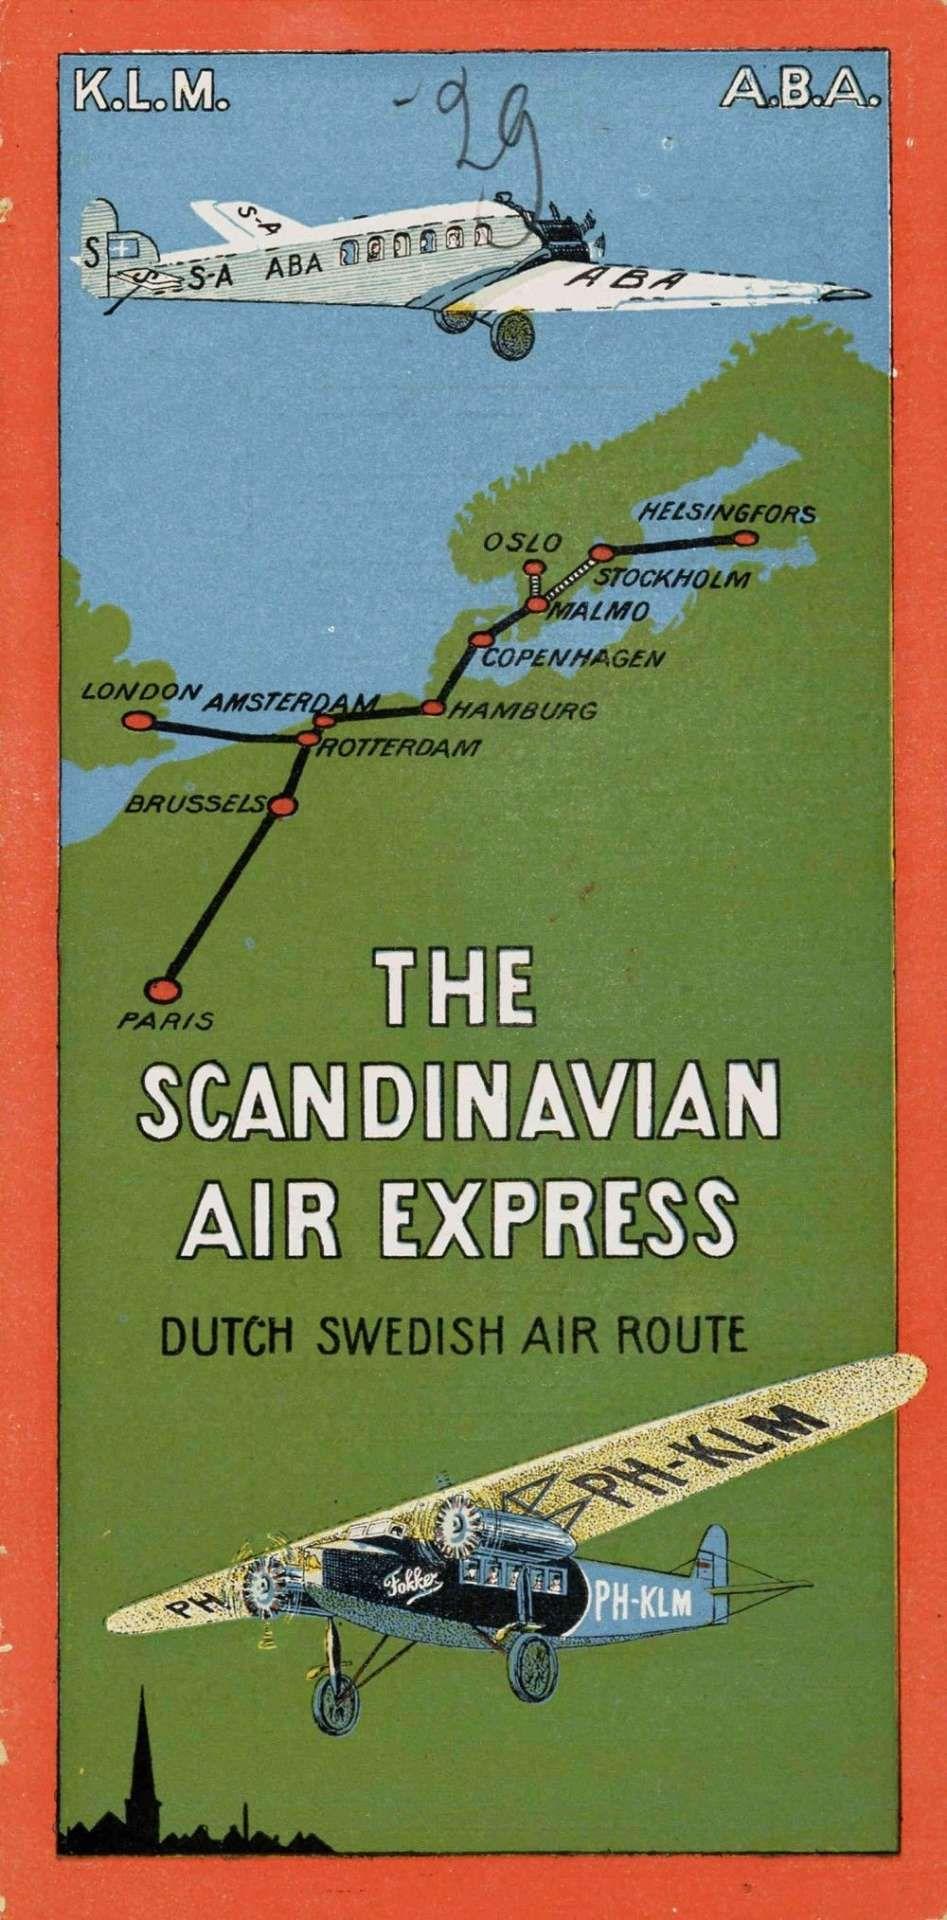 1929 K L M A B A The Scandinavian Express Dutch Swedish Air Route 1000x2027 Jpg 947 Vintage Travel Posters Vintage Airline Posters Vintage Advertising Posters